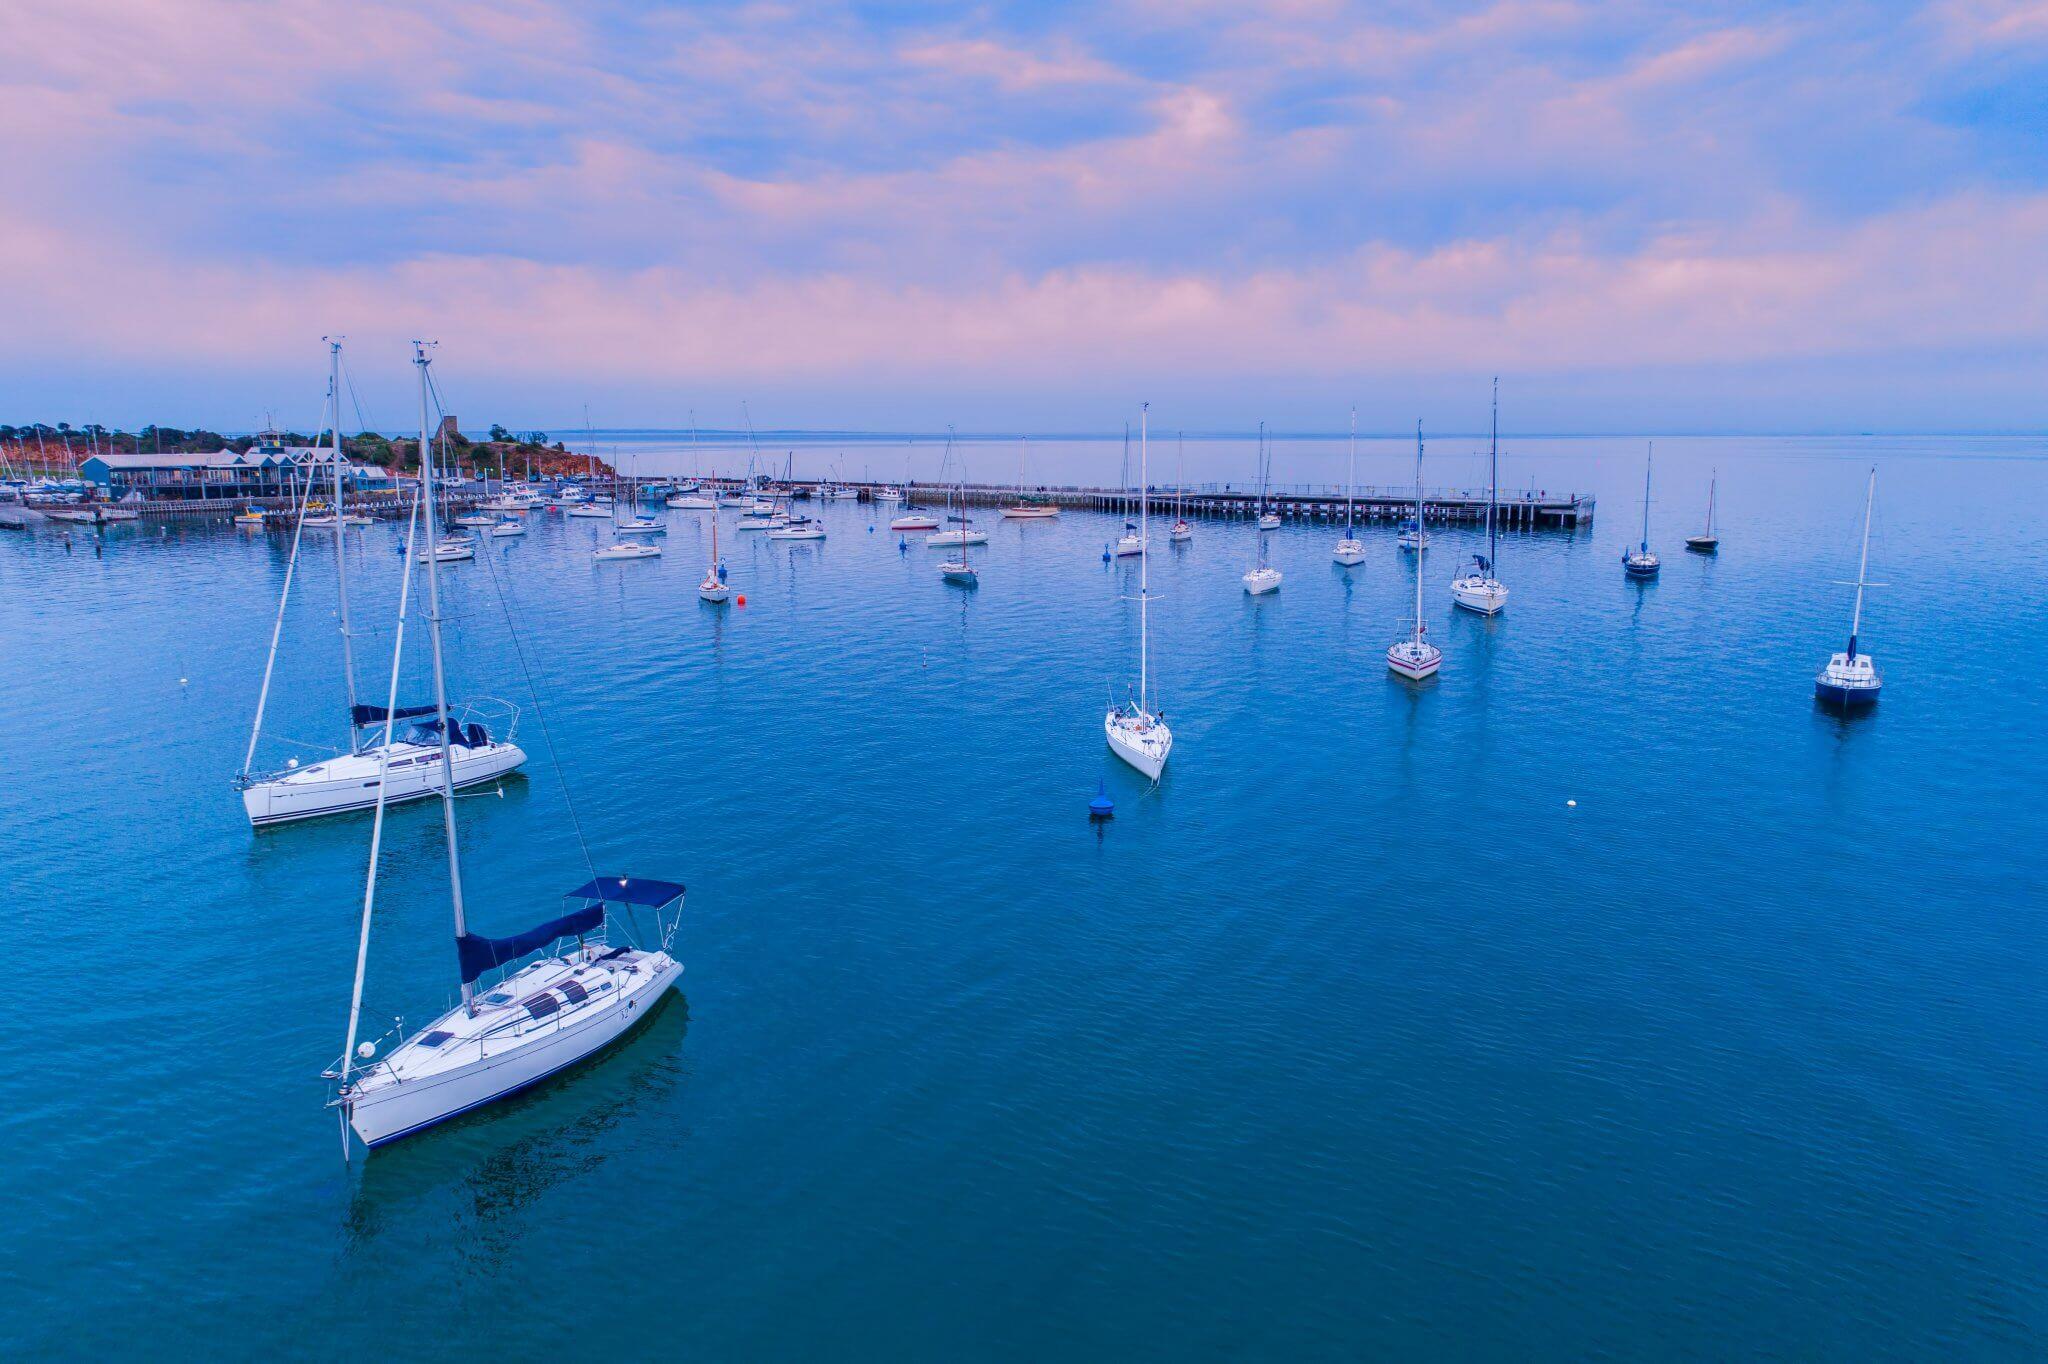 Moored boats near Mornington Pier at sunrise